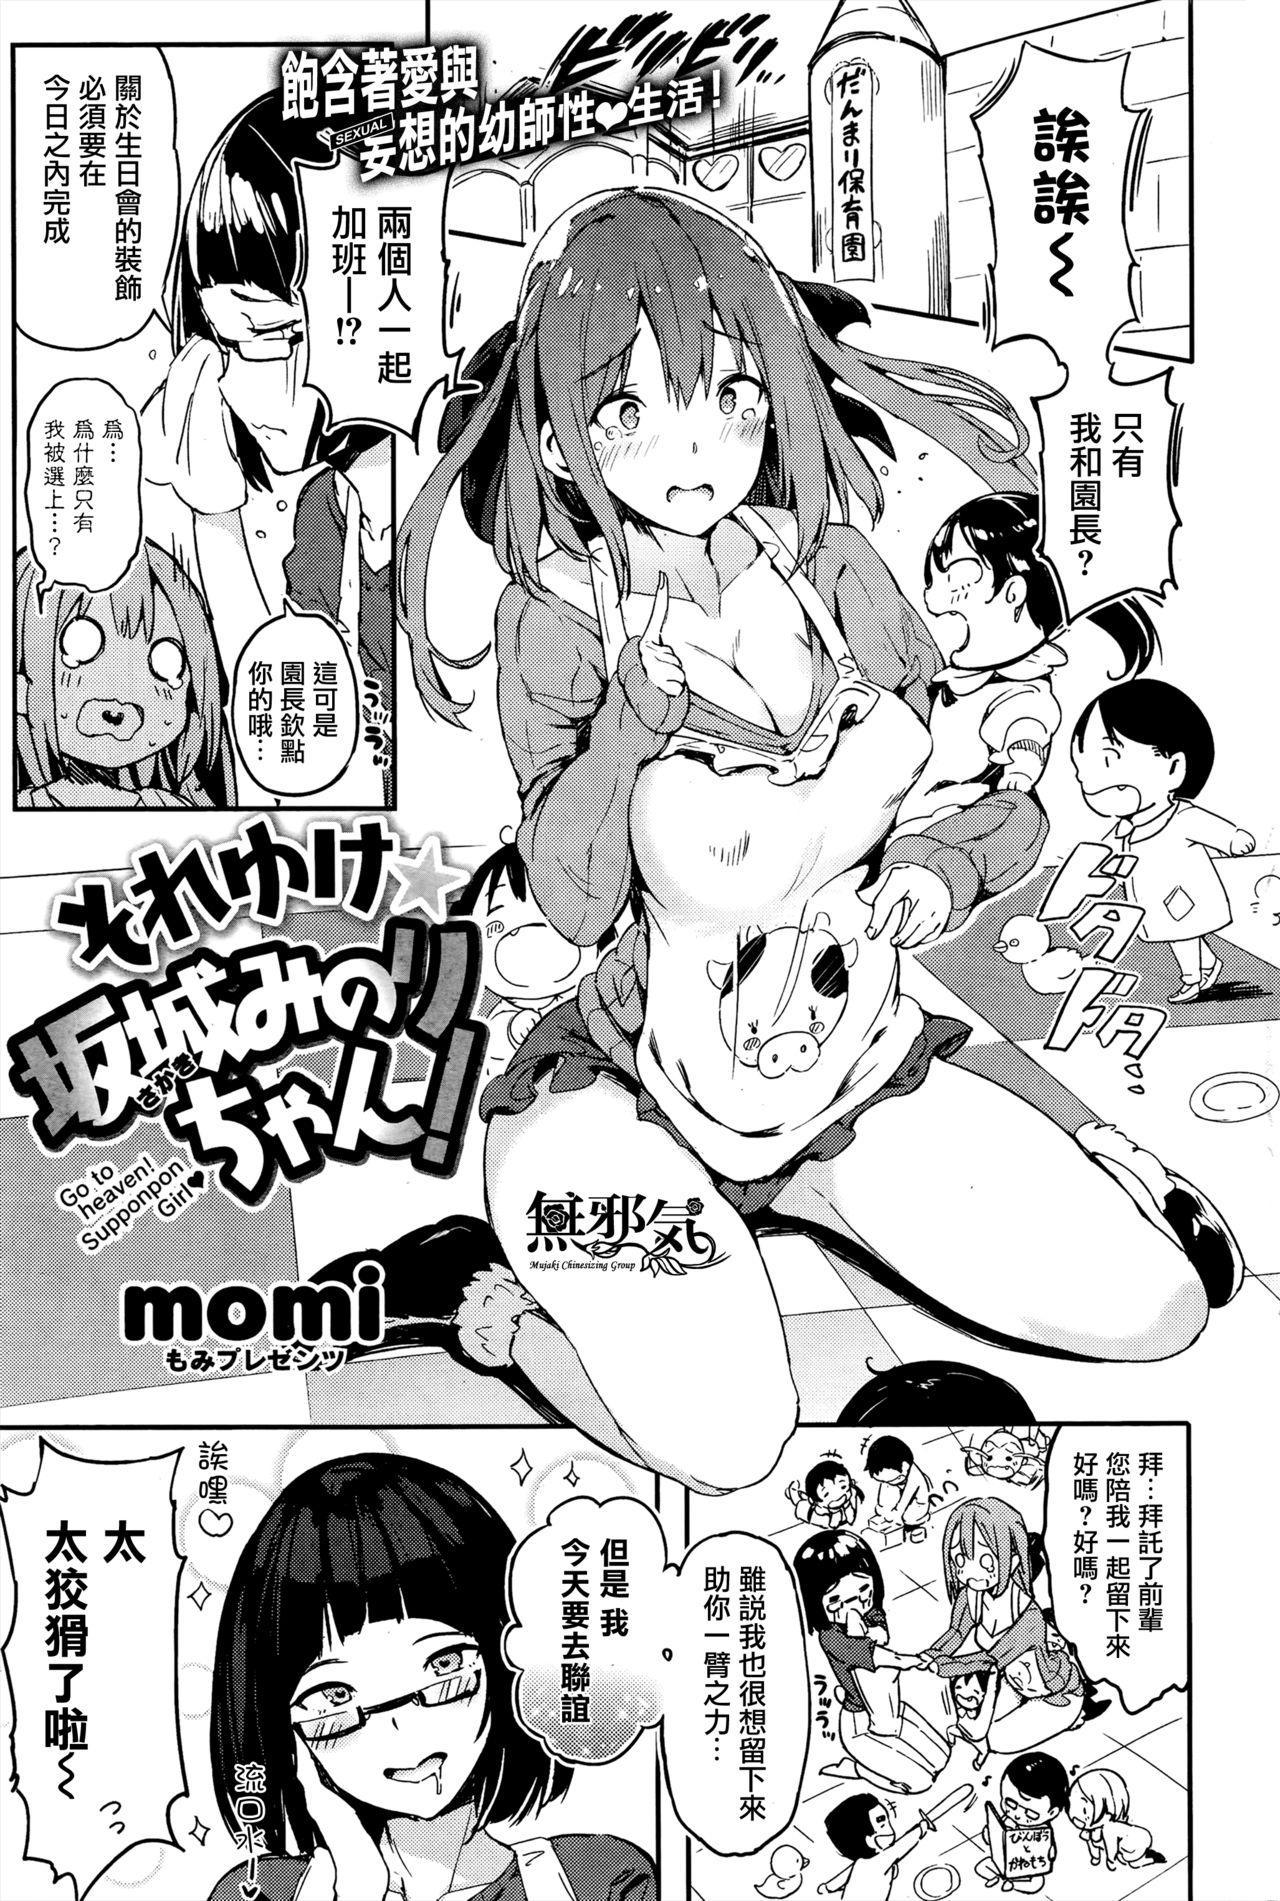 Soreyuke Sakaki Minori-chan! 0